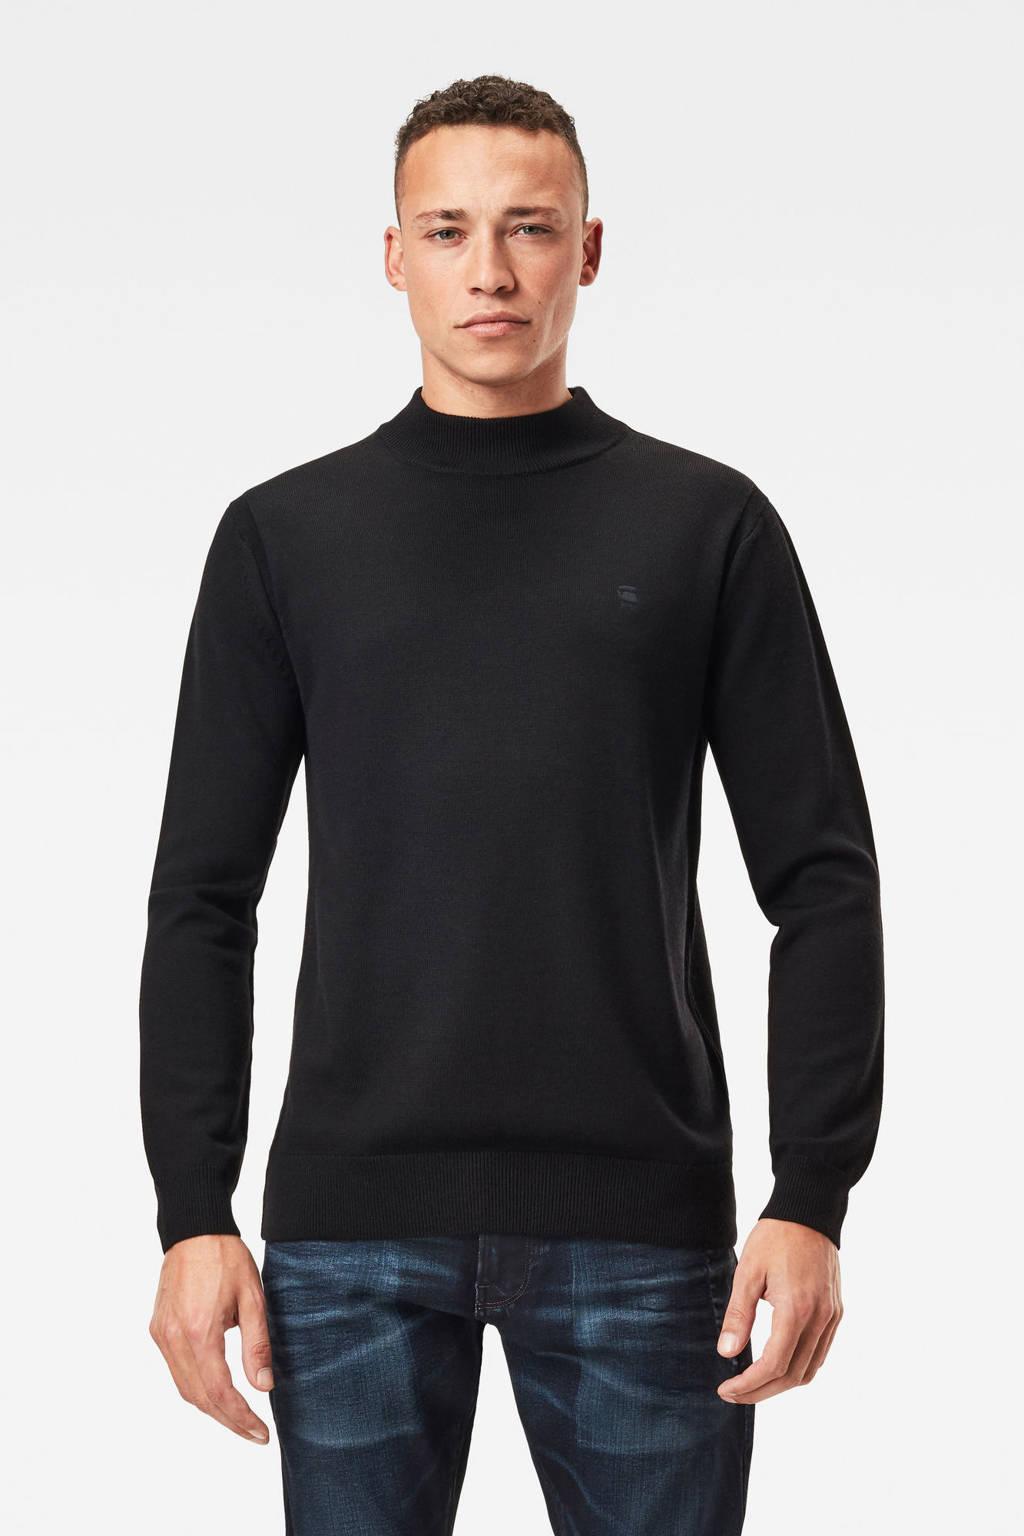 G-Star RAW wollen trui zwart, Zwart